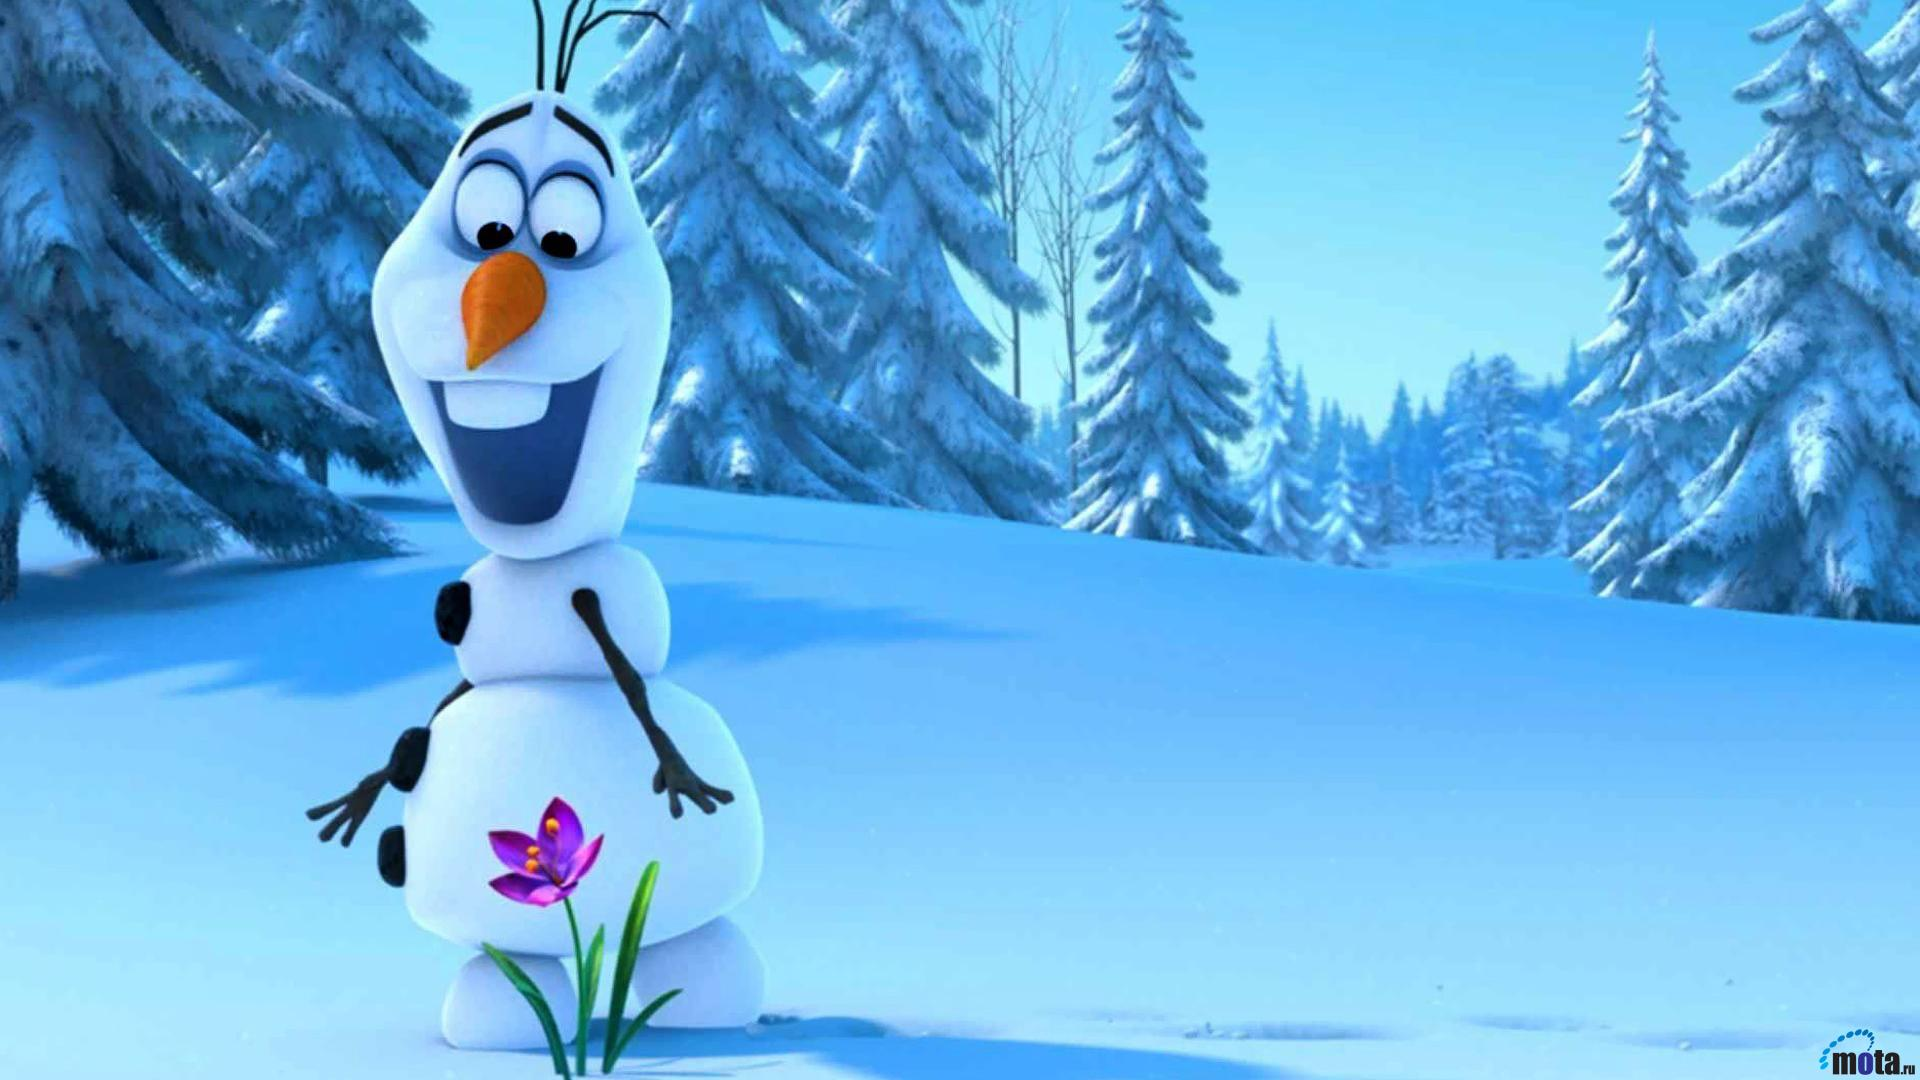 Wallpaper Olaf and snowdrop   Frozen 1920 x 1080 HDTV 1080p Desktop 1920x1080